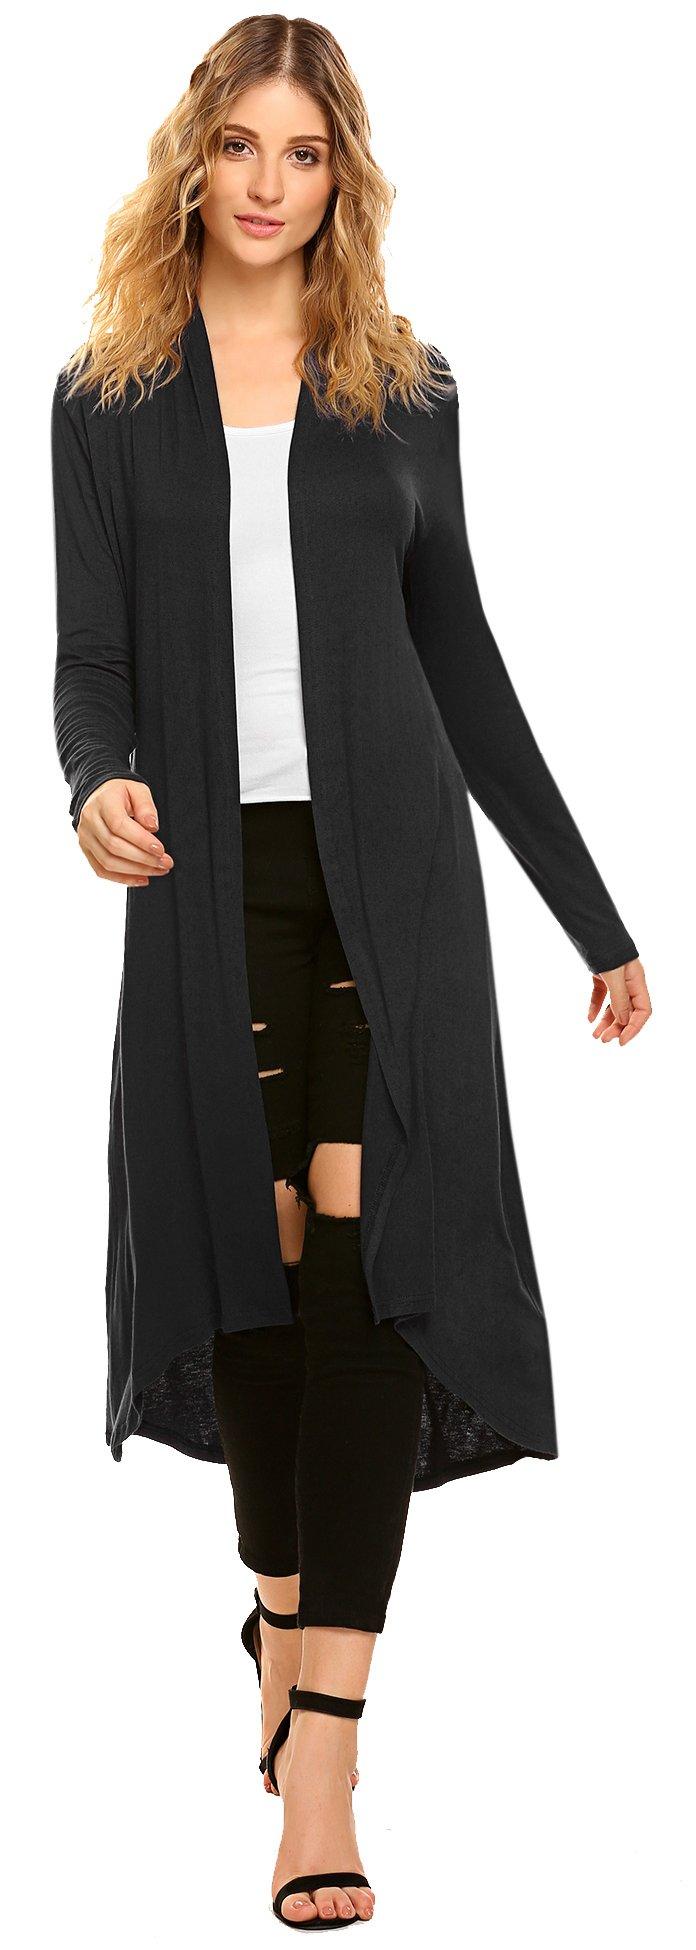 POGTMM Women Lightweight High Low Drape Front Long Sleeve Plus Size Cardigan (US XL(16-18), Black)